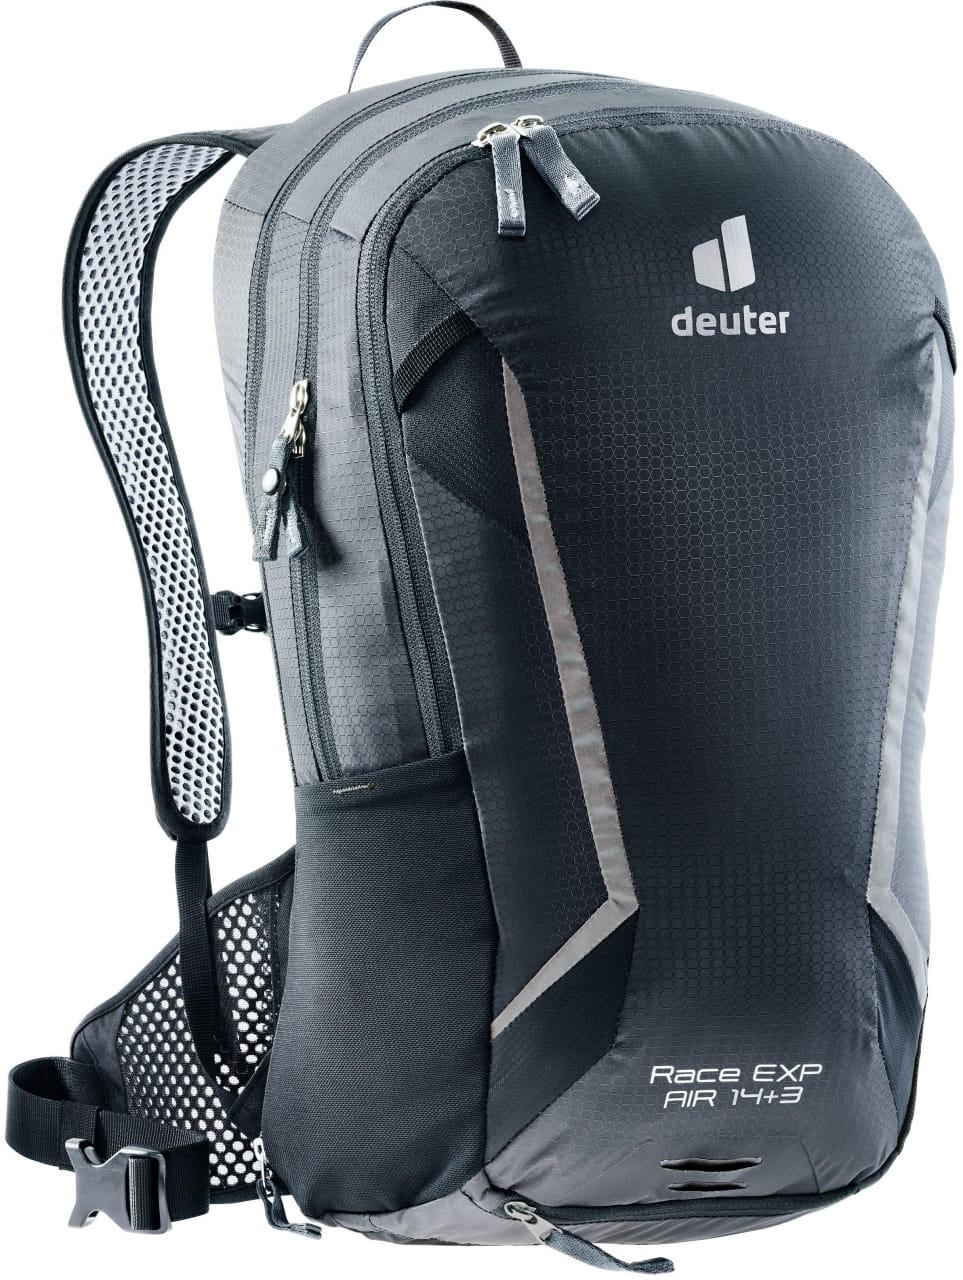 Cyklistický batoh Deuter Race EXP Air